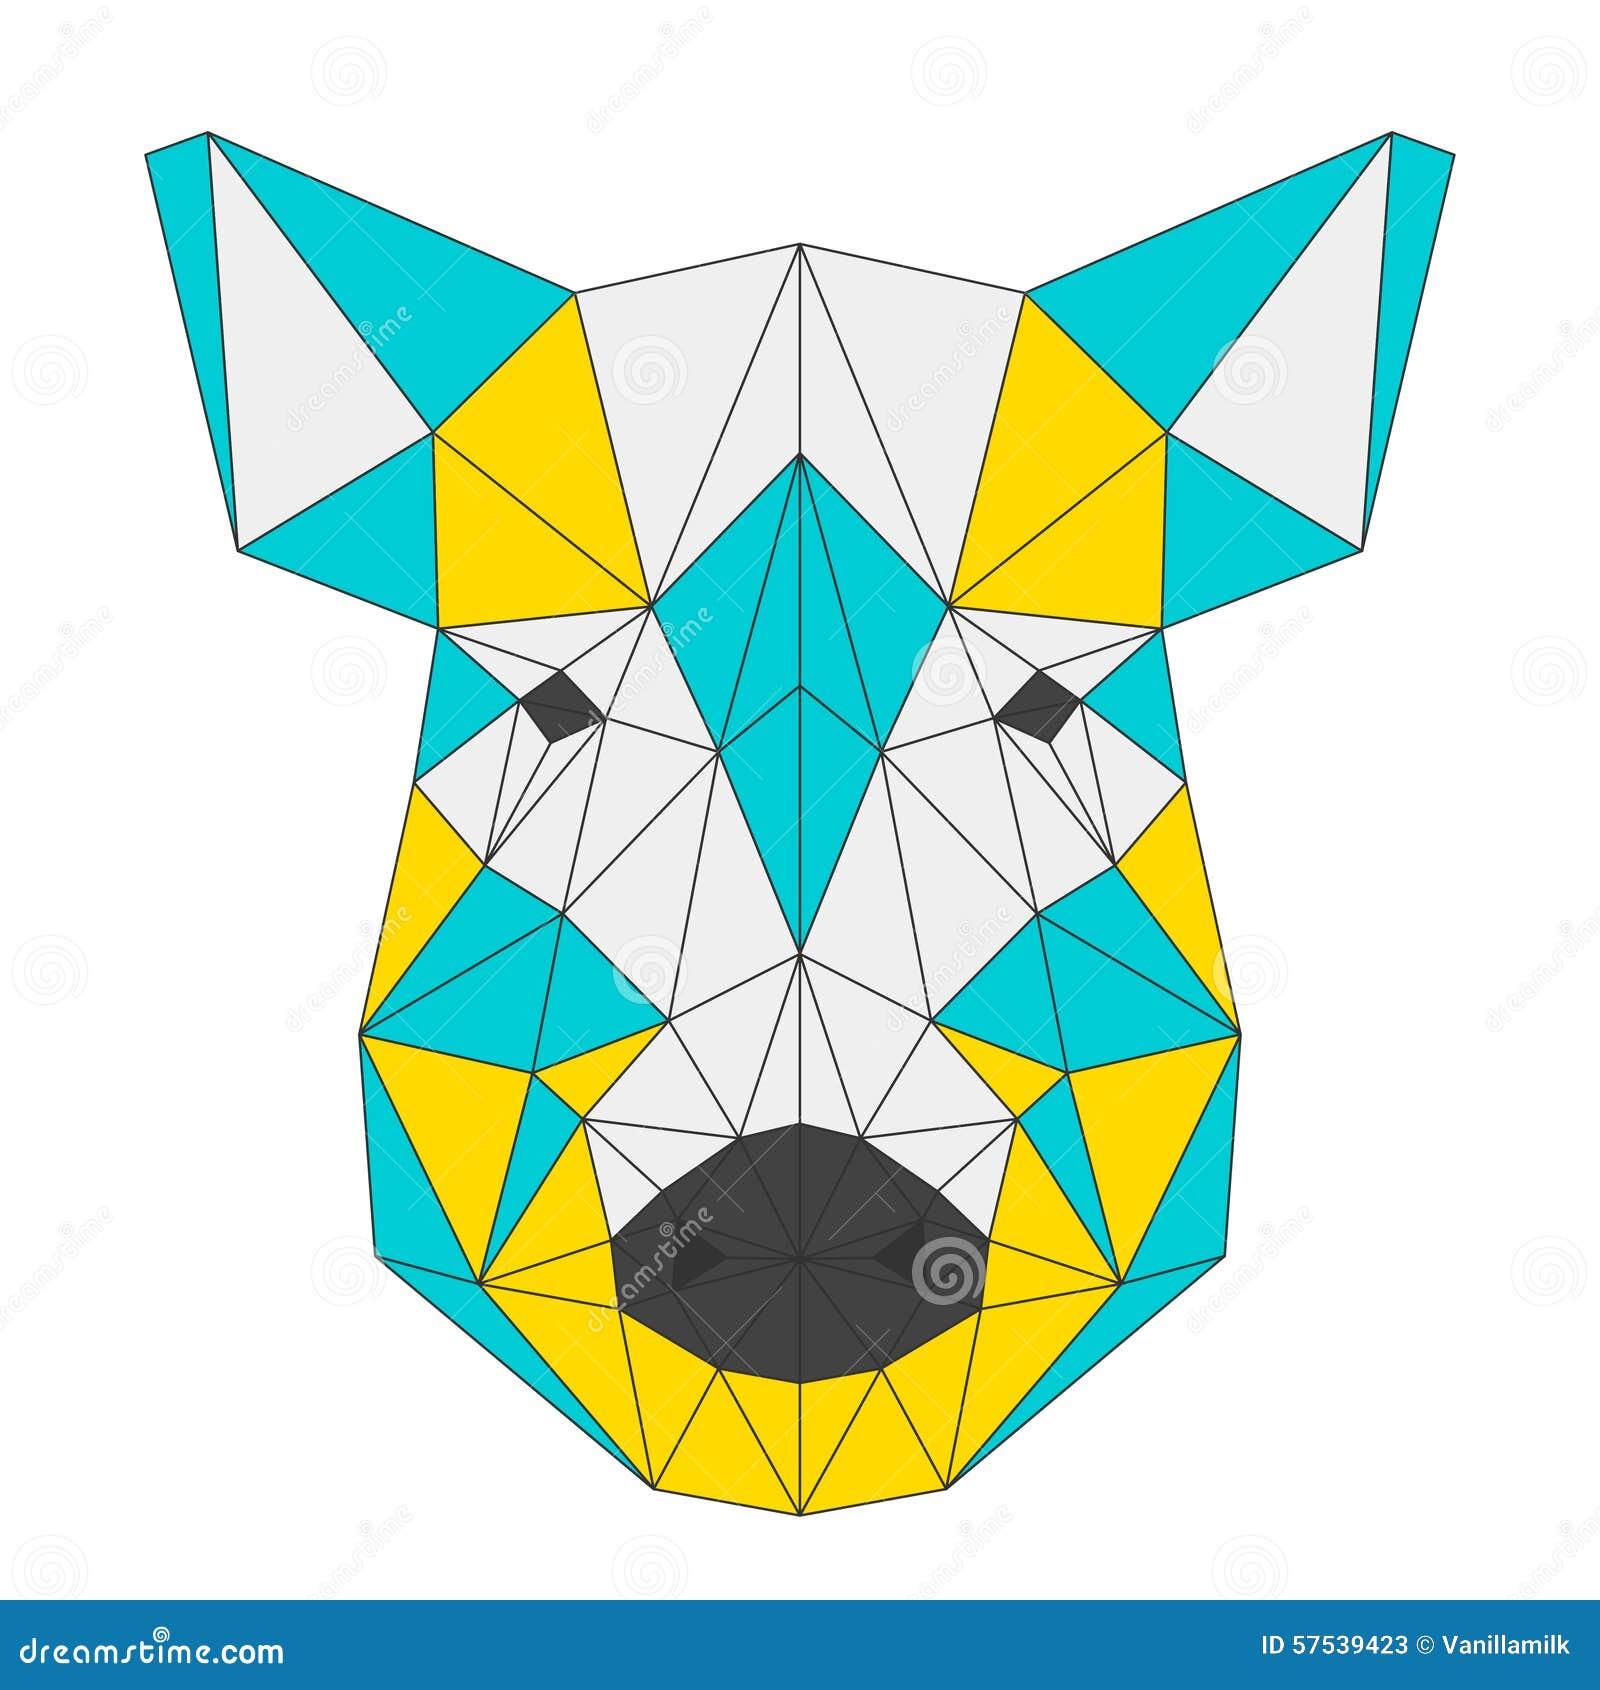 geometric yellow background illustration - photo #6